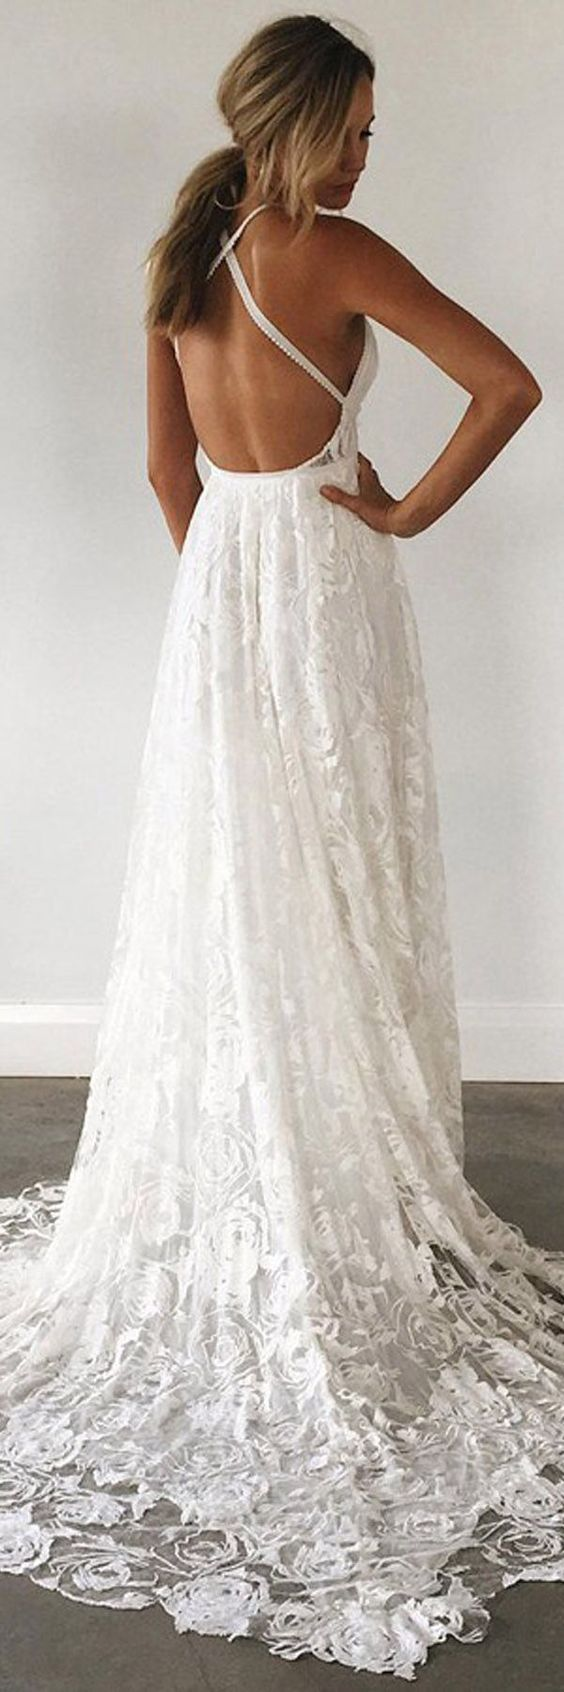 Halter empire white lace promevening dressbeach lace wedding dress